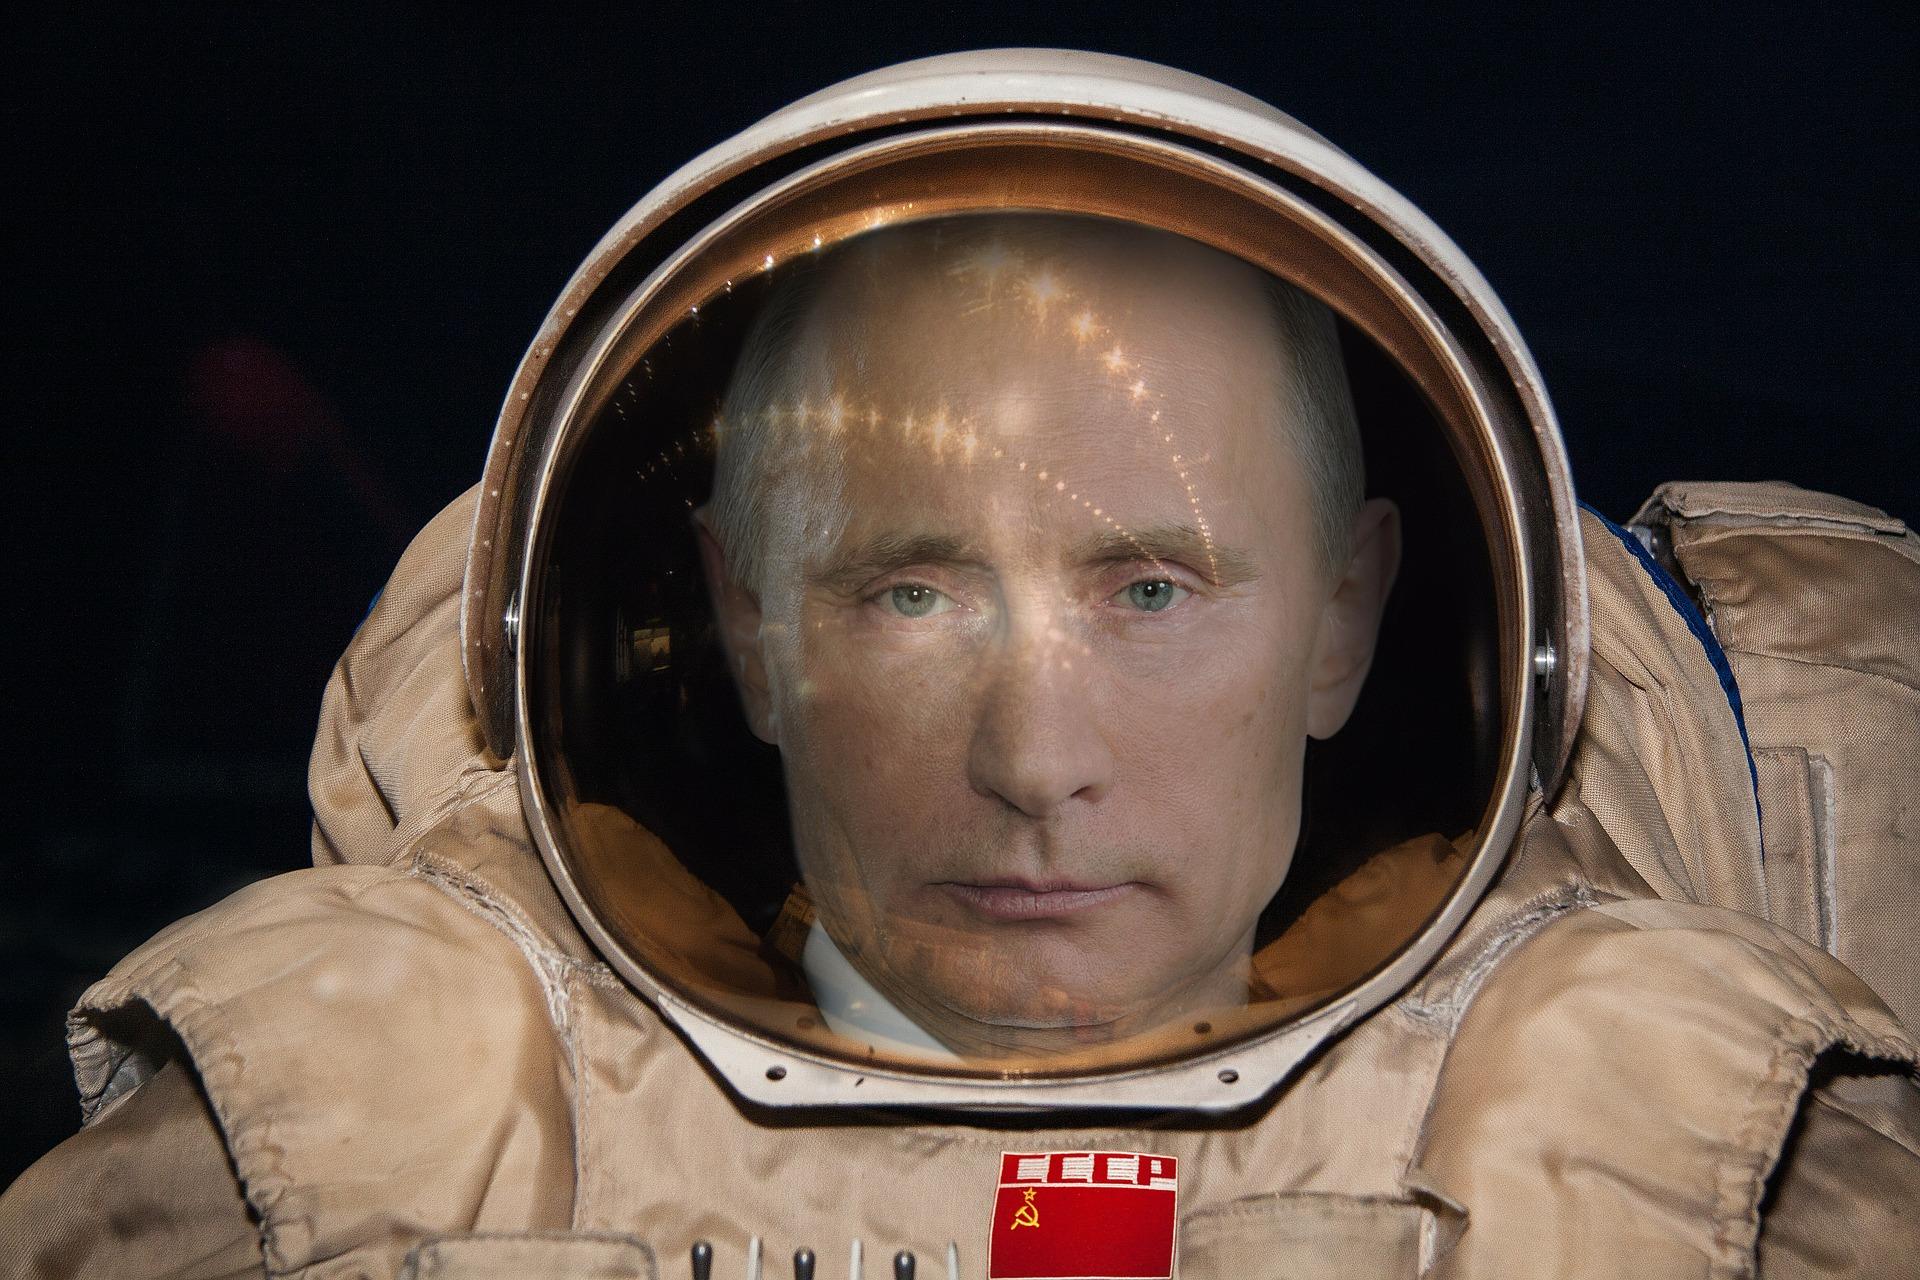 Vladimir Putin, Astronaut, Famous, President, Russia, HQ Photo